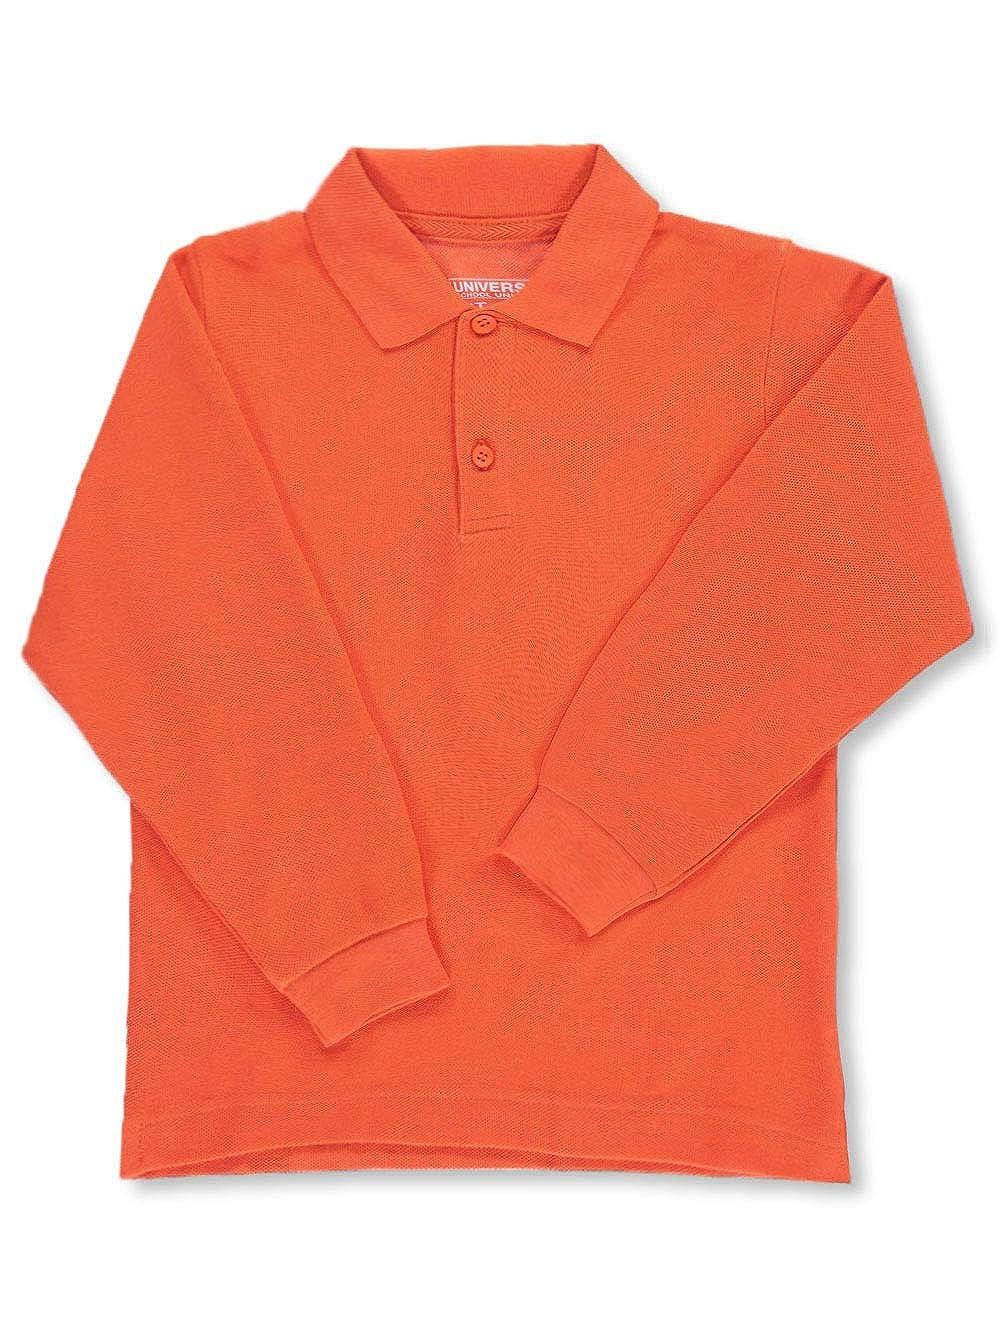 Universal Unisex Long Sleeve Pique Polo, Orange, 6